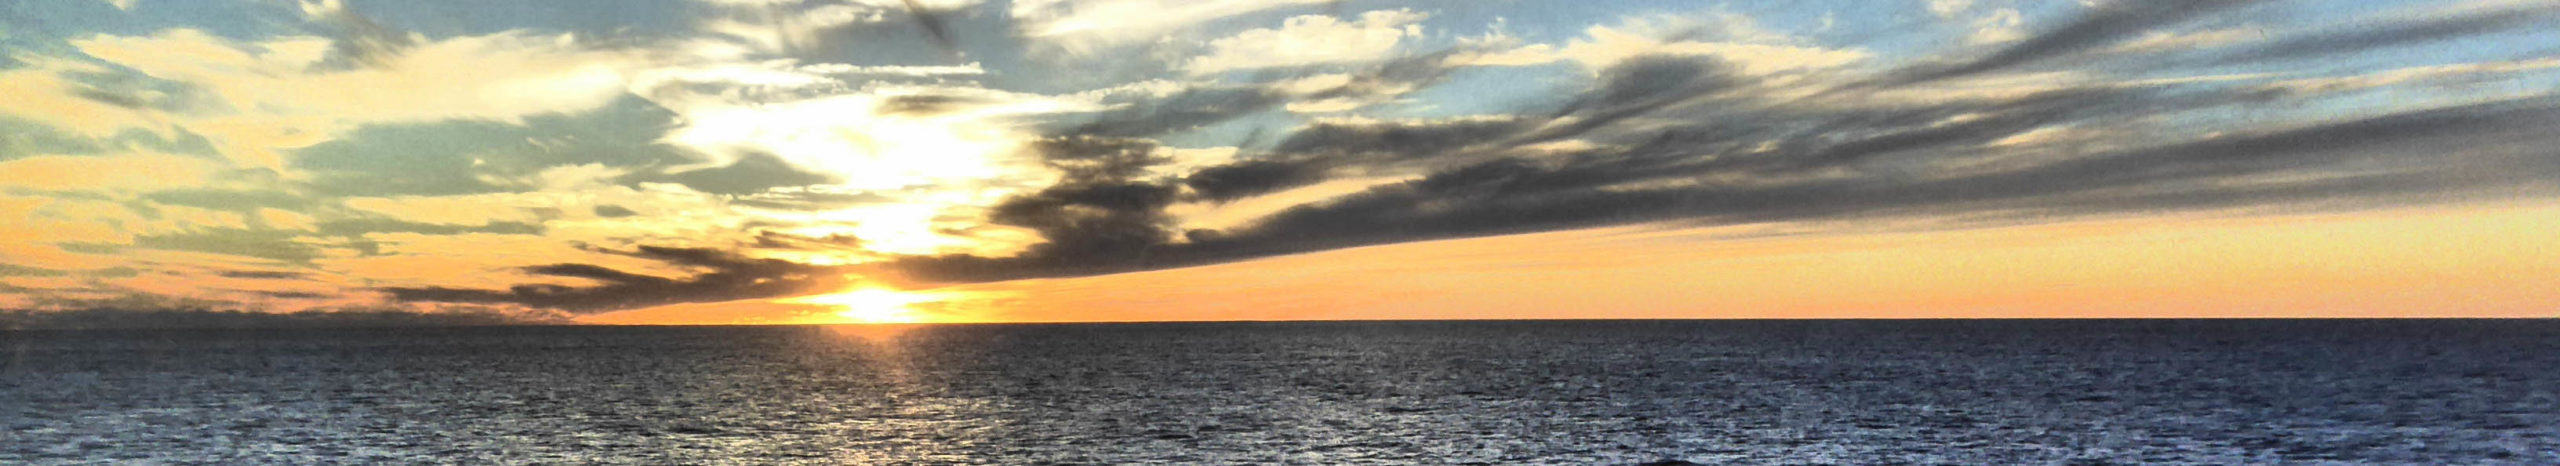 Юго-Восточная Азия<br> Quantum of the Seas (Royal Caribbean International)